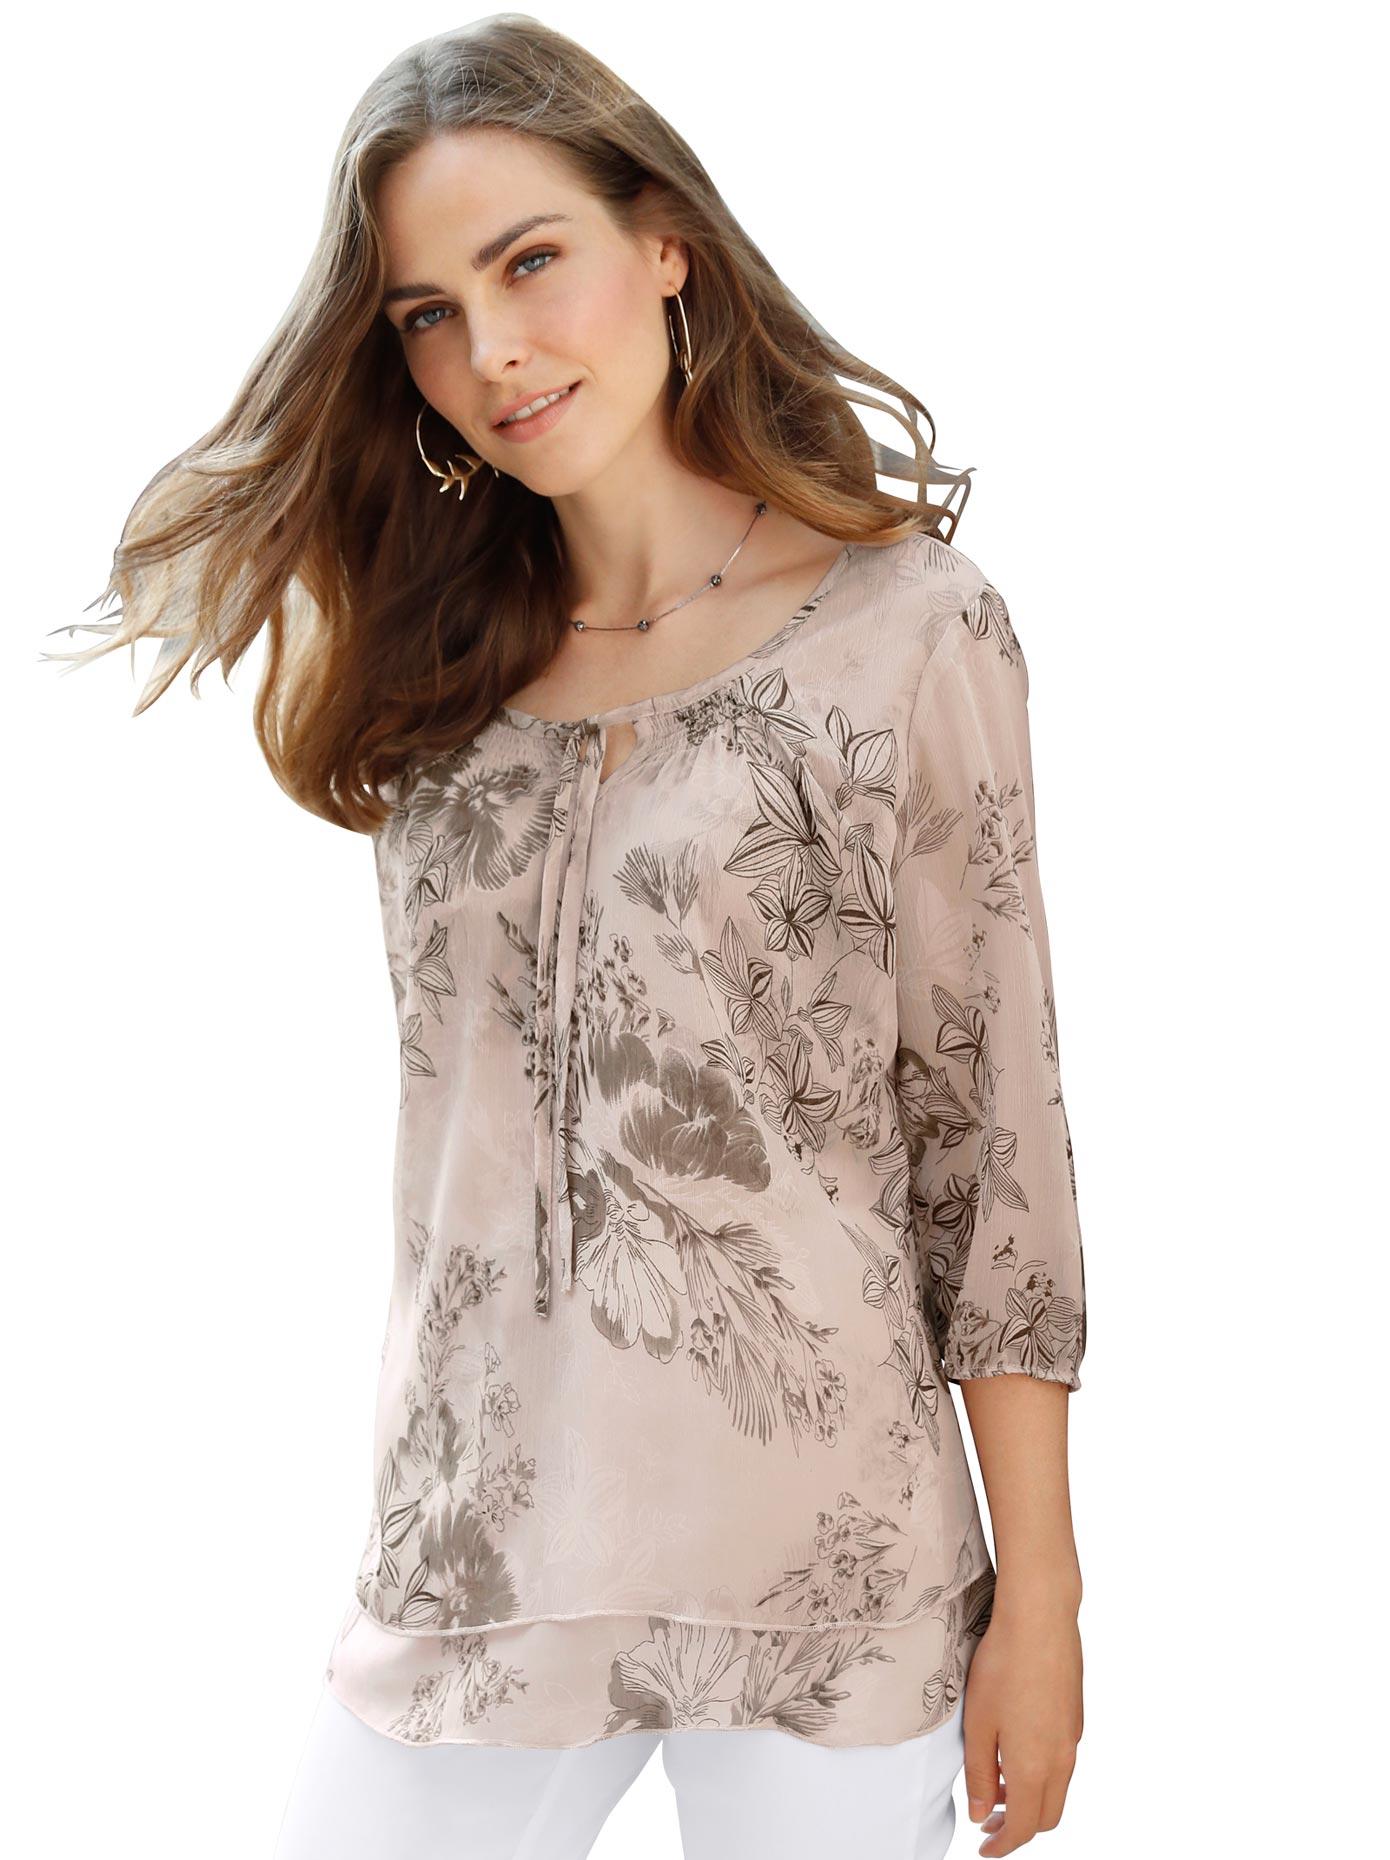 Classic Basics Bluse aus luftigem Chiffon